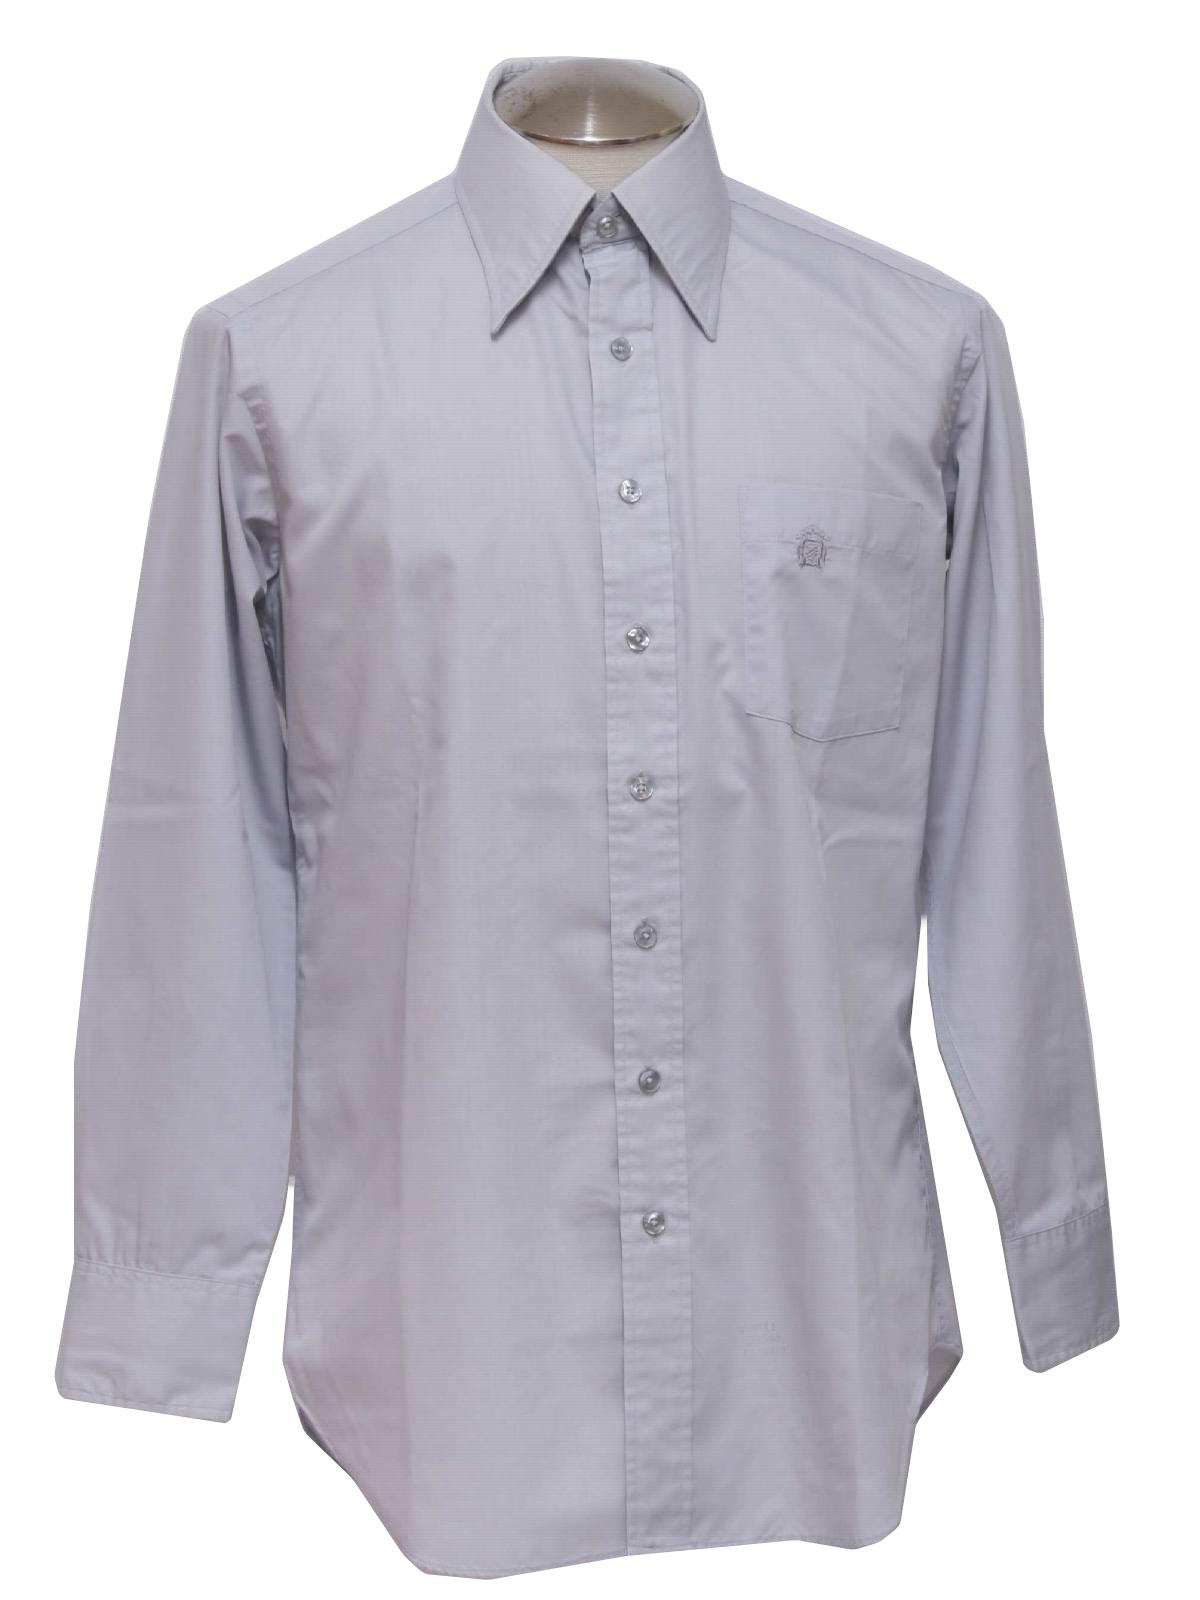 70s Shirt 70s Oleg Cassini Couture Collection Designer Mens